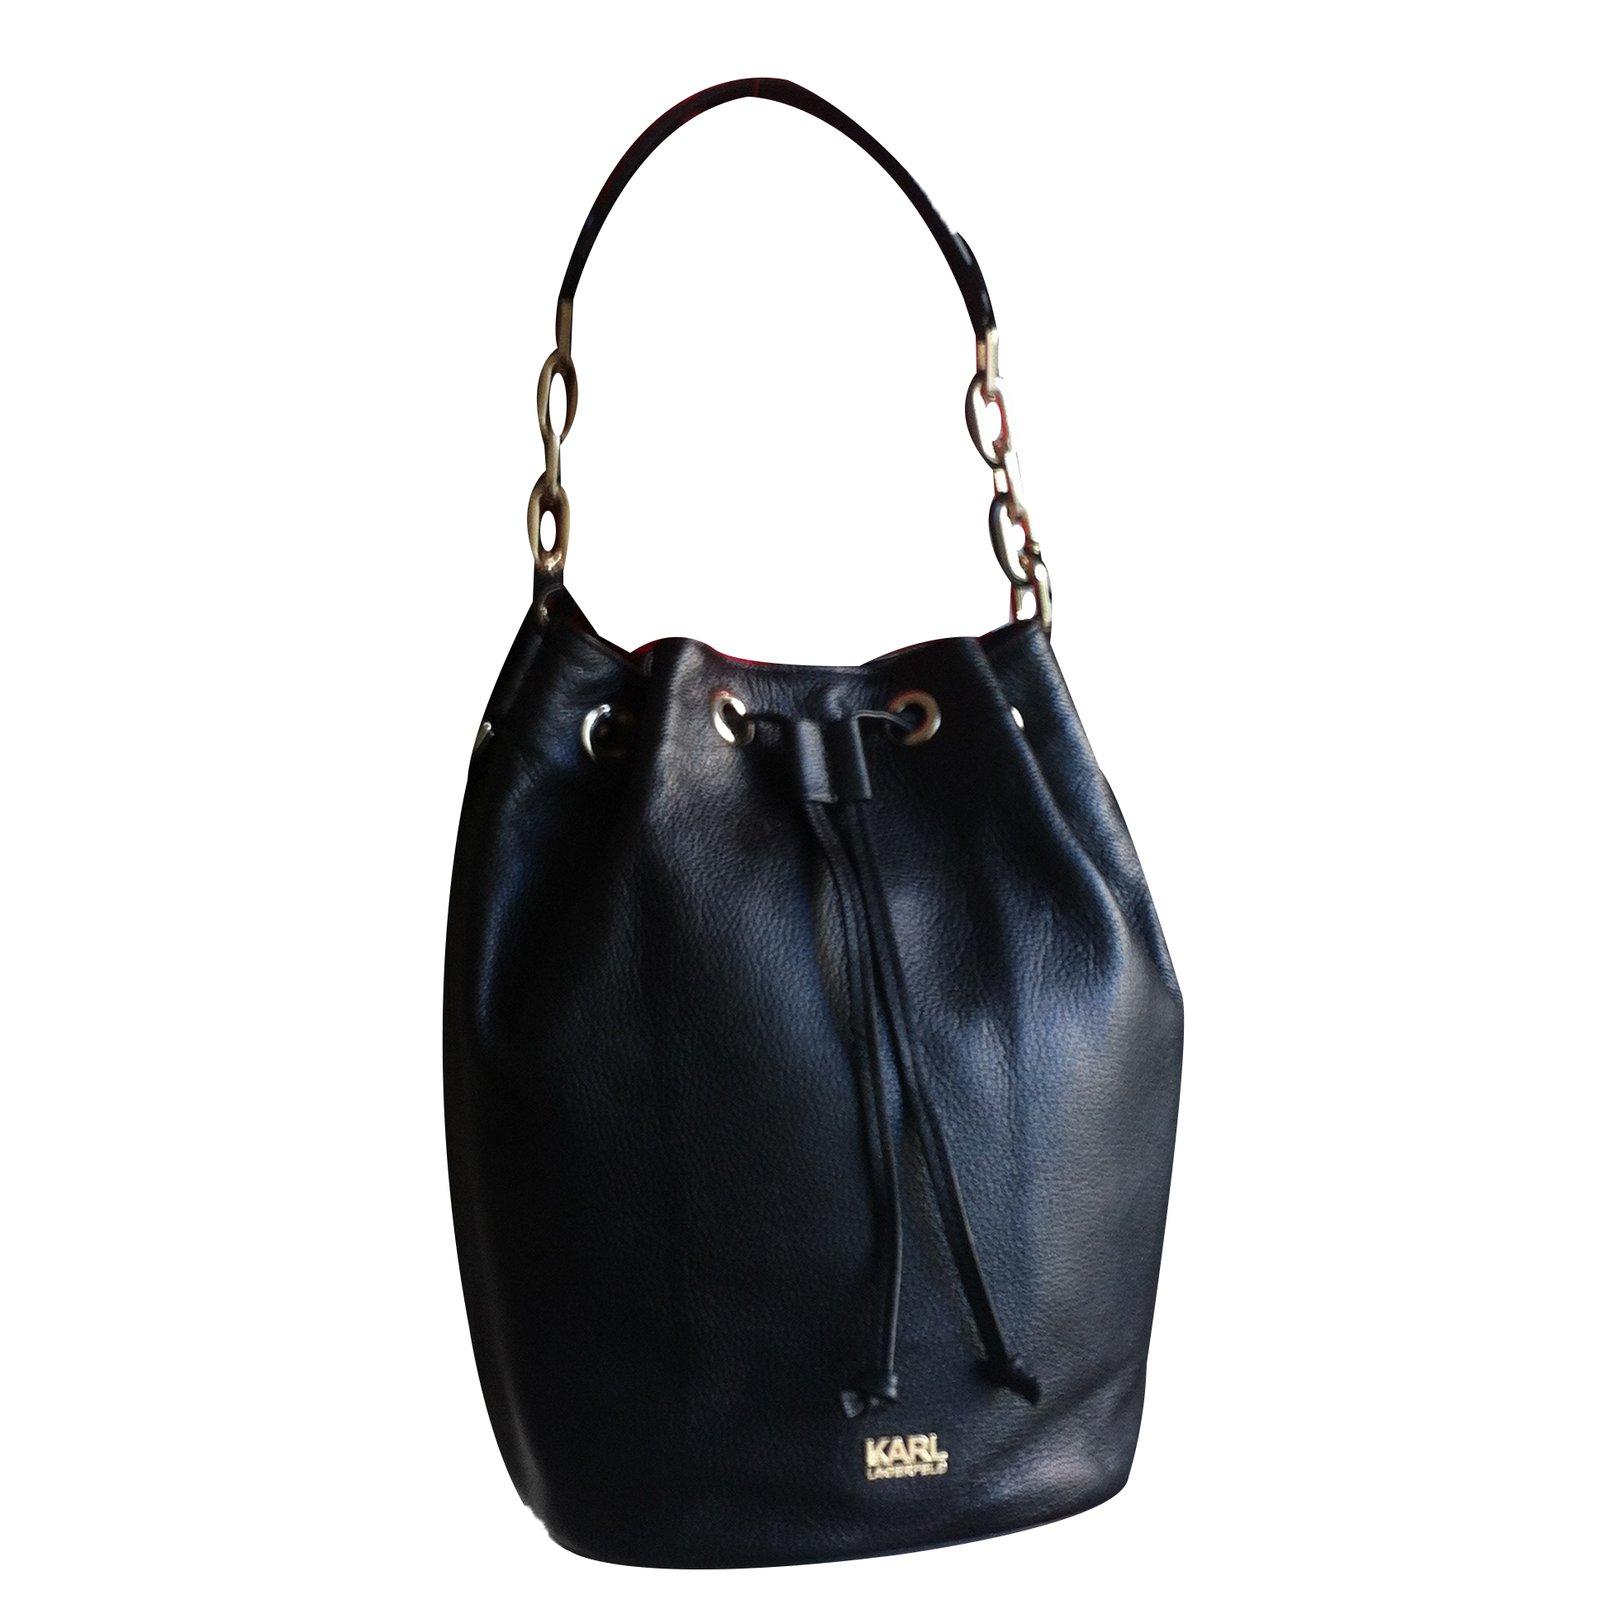 Karl Lagerfeld Bucket Bag Handbags Leather Black Ref 29269